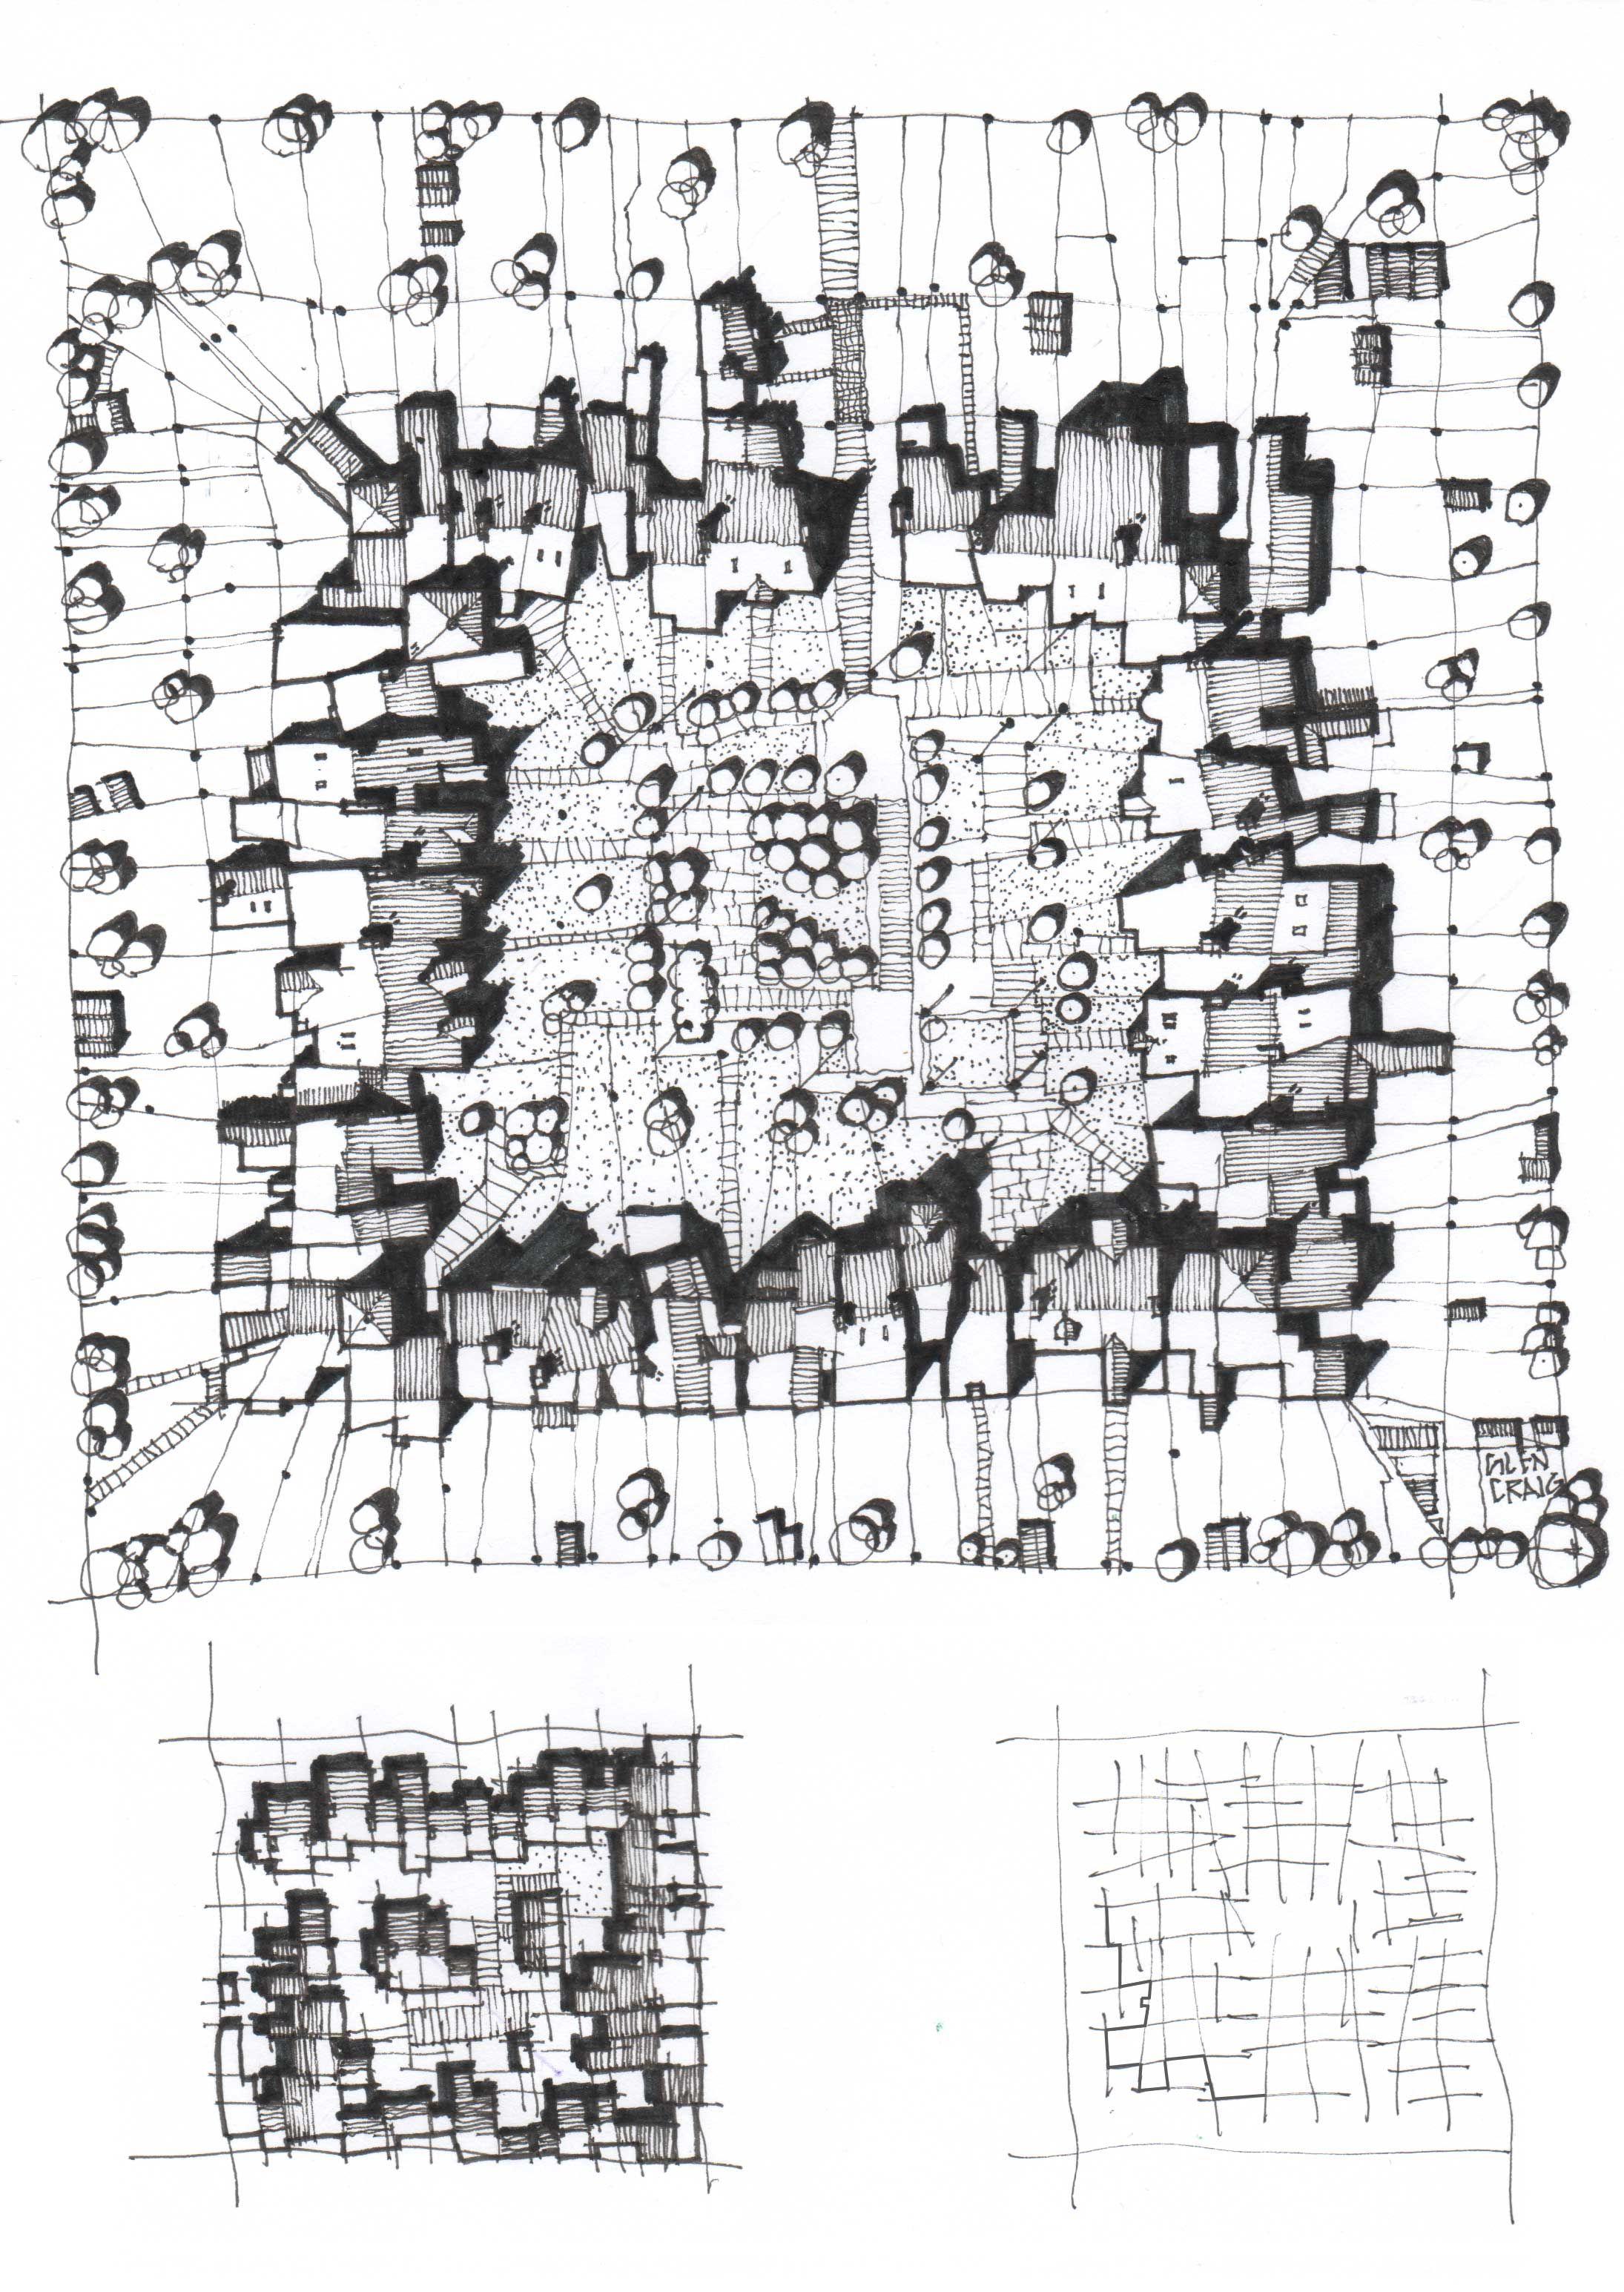 Courtyard pen and ink sketch of a courtyard development urban